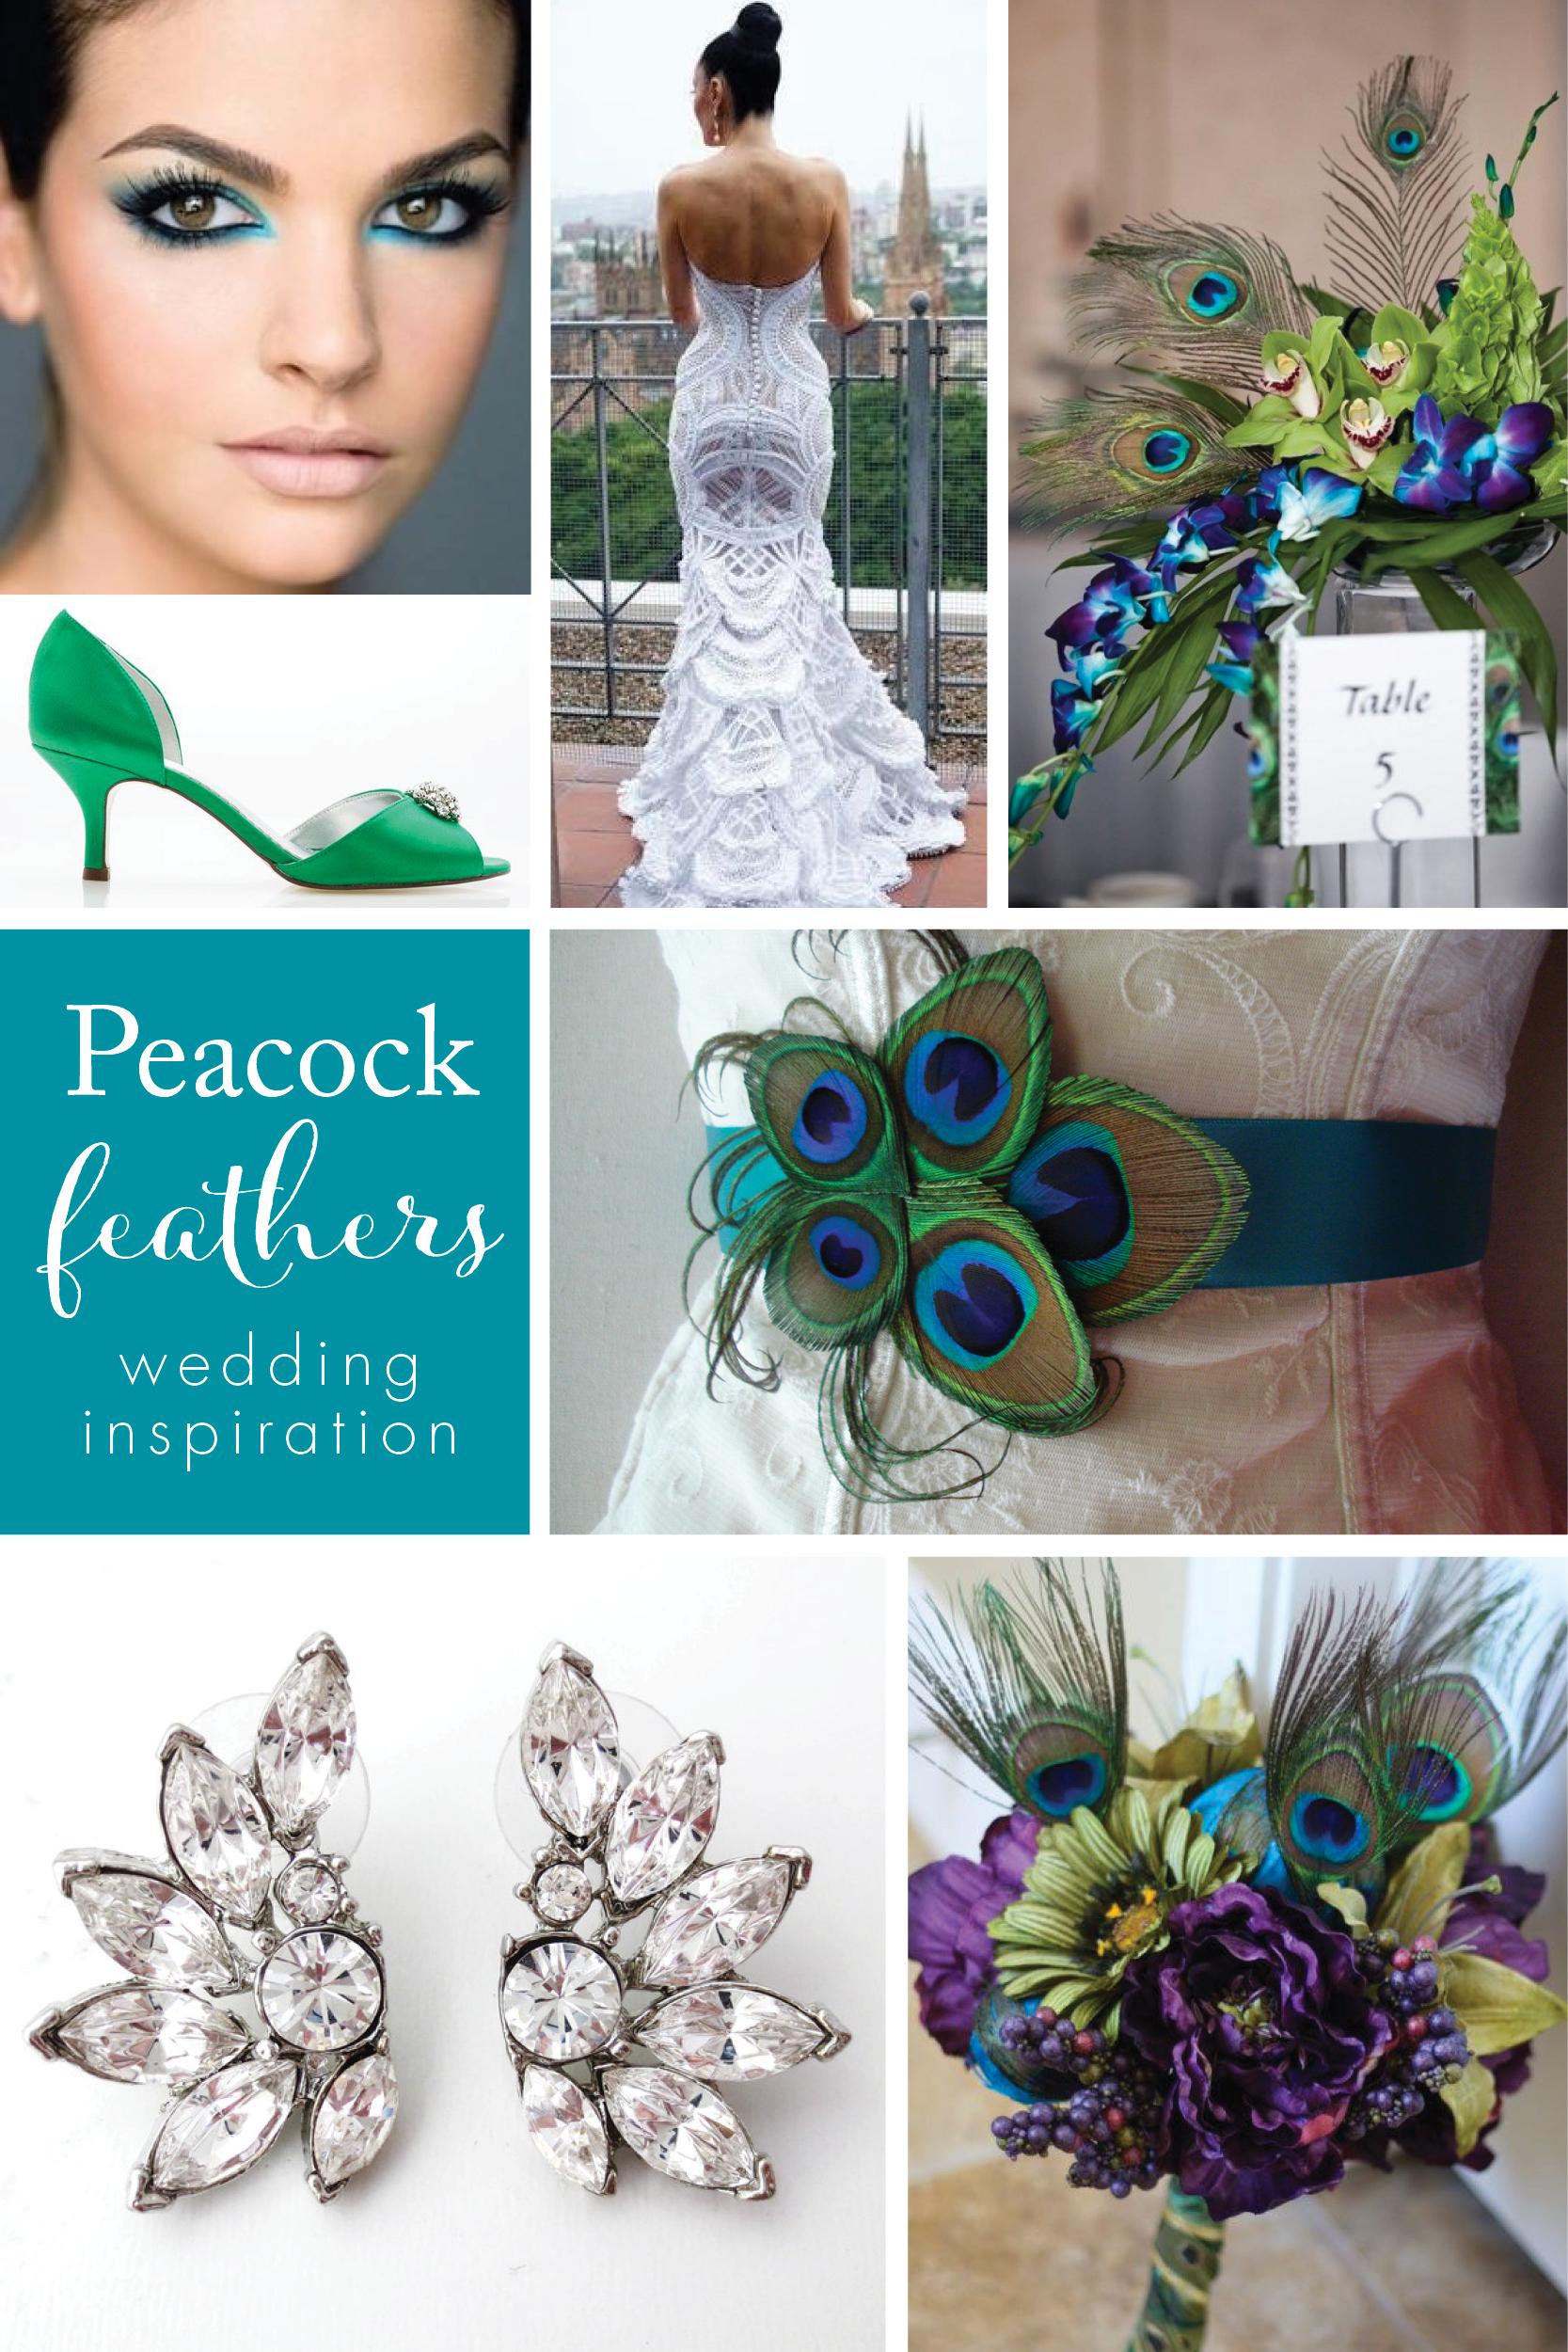 Peacock-Mood-Board.jpg